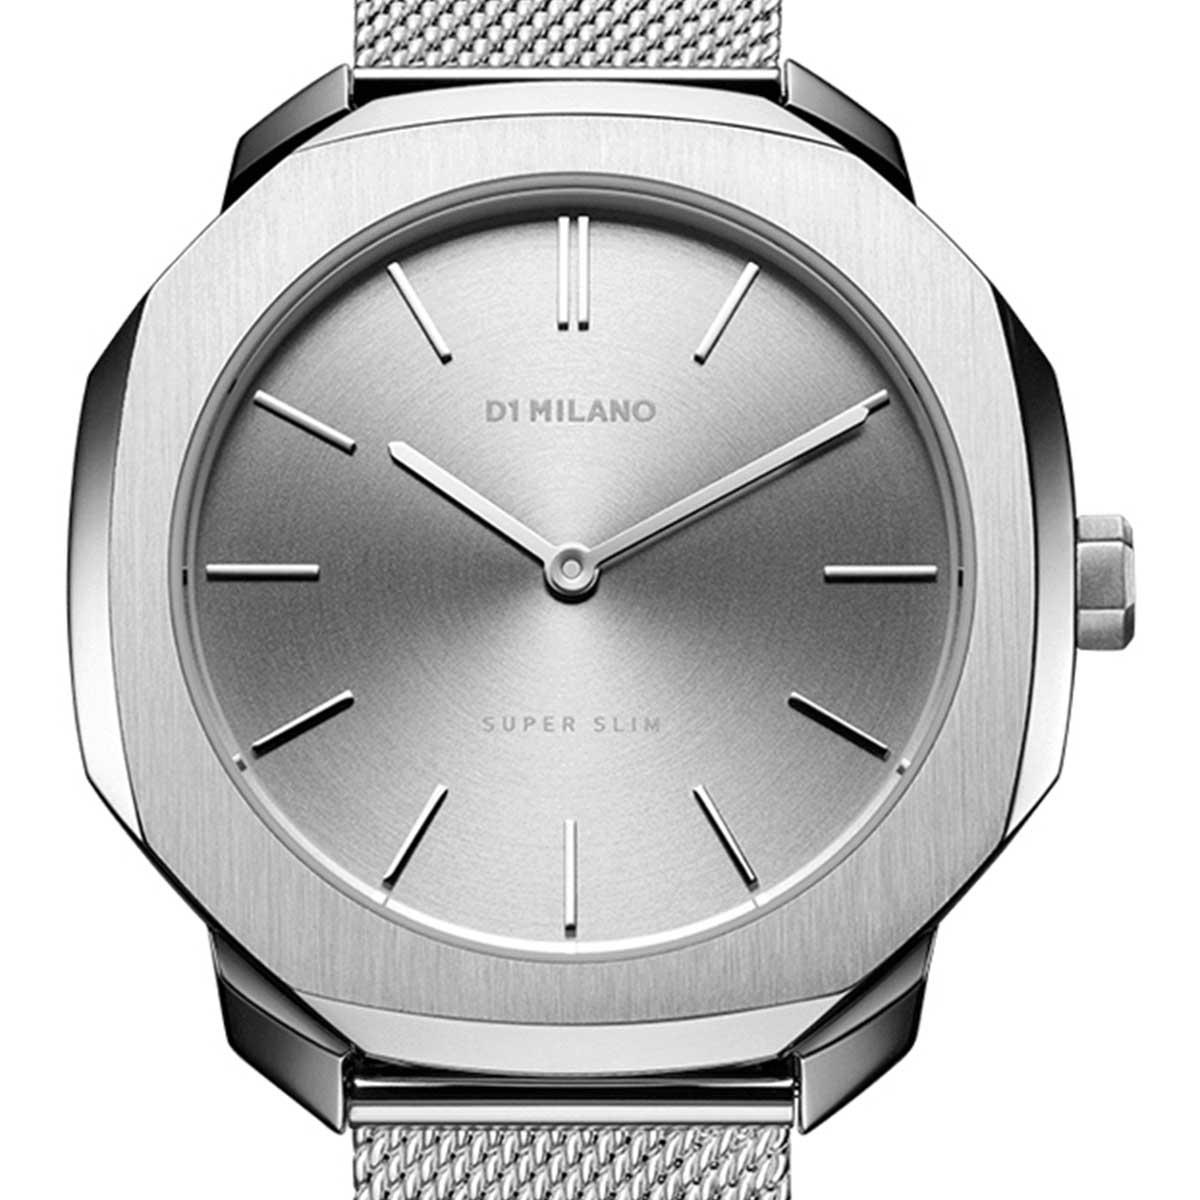 D1 MILANO ディーワンミラノ 電池式クォーツ 腕時計 [SSML01] 並行輸入品